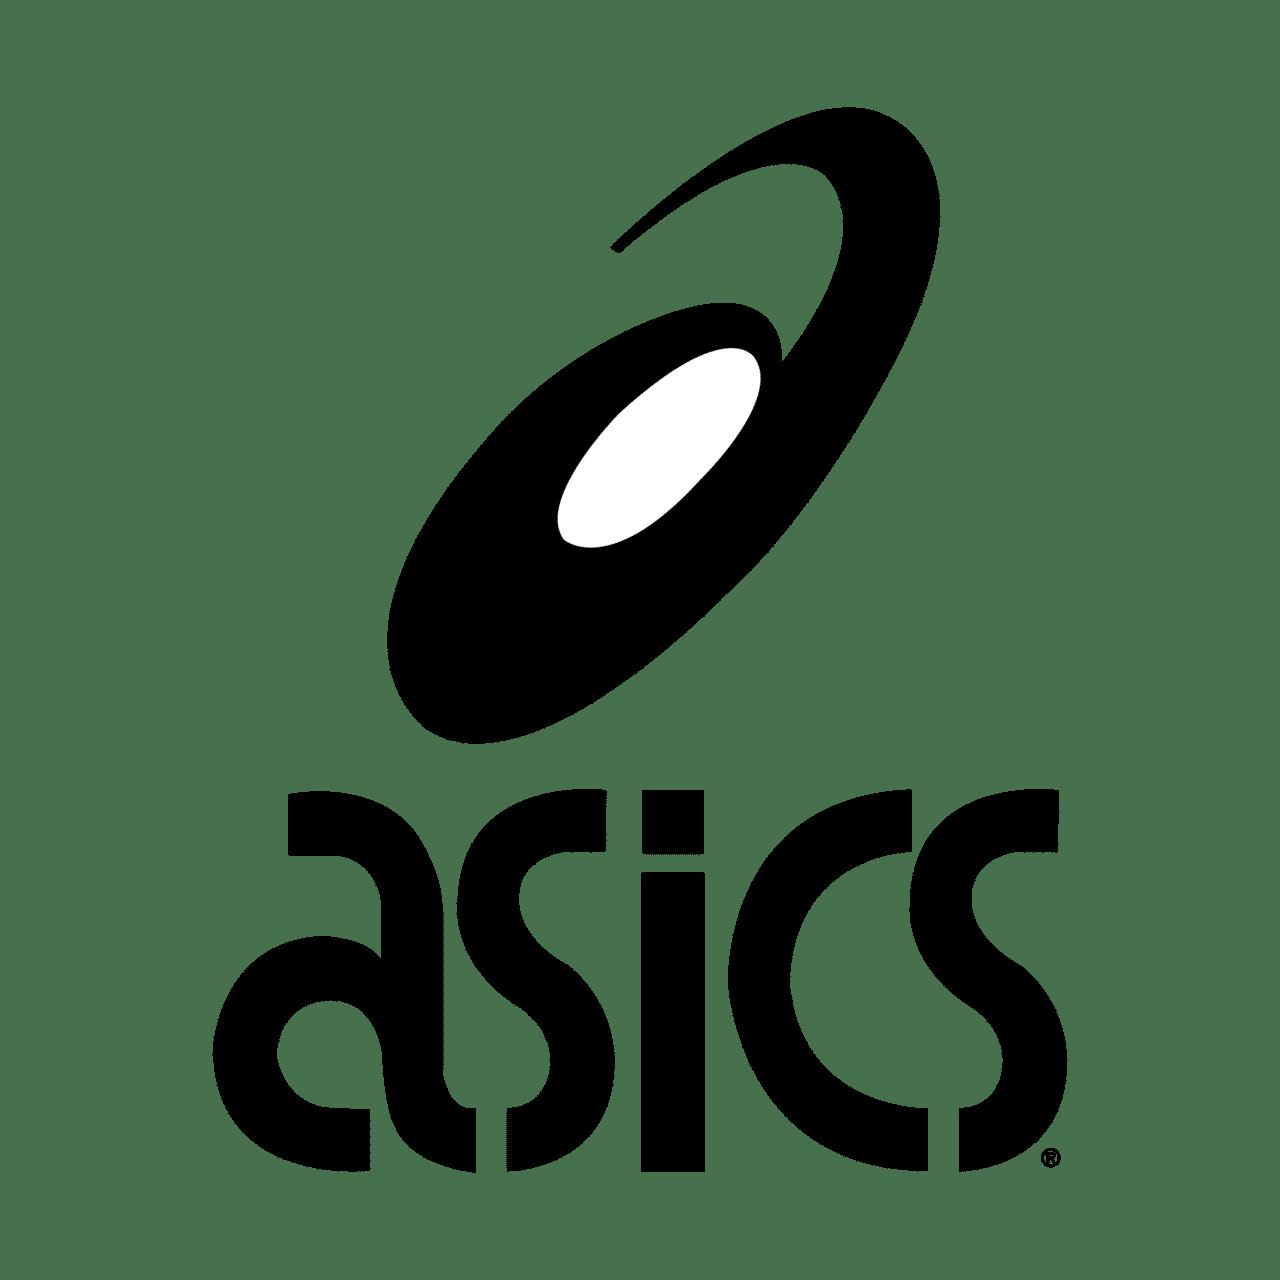 asics-logo-3